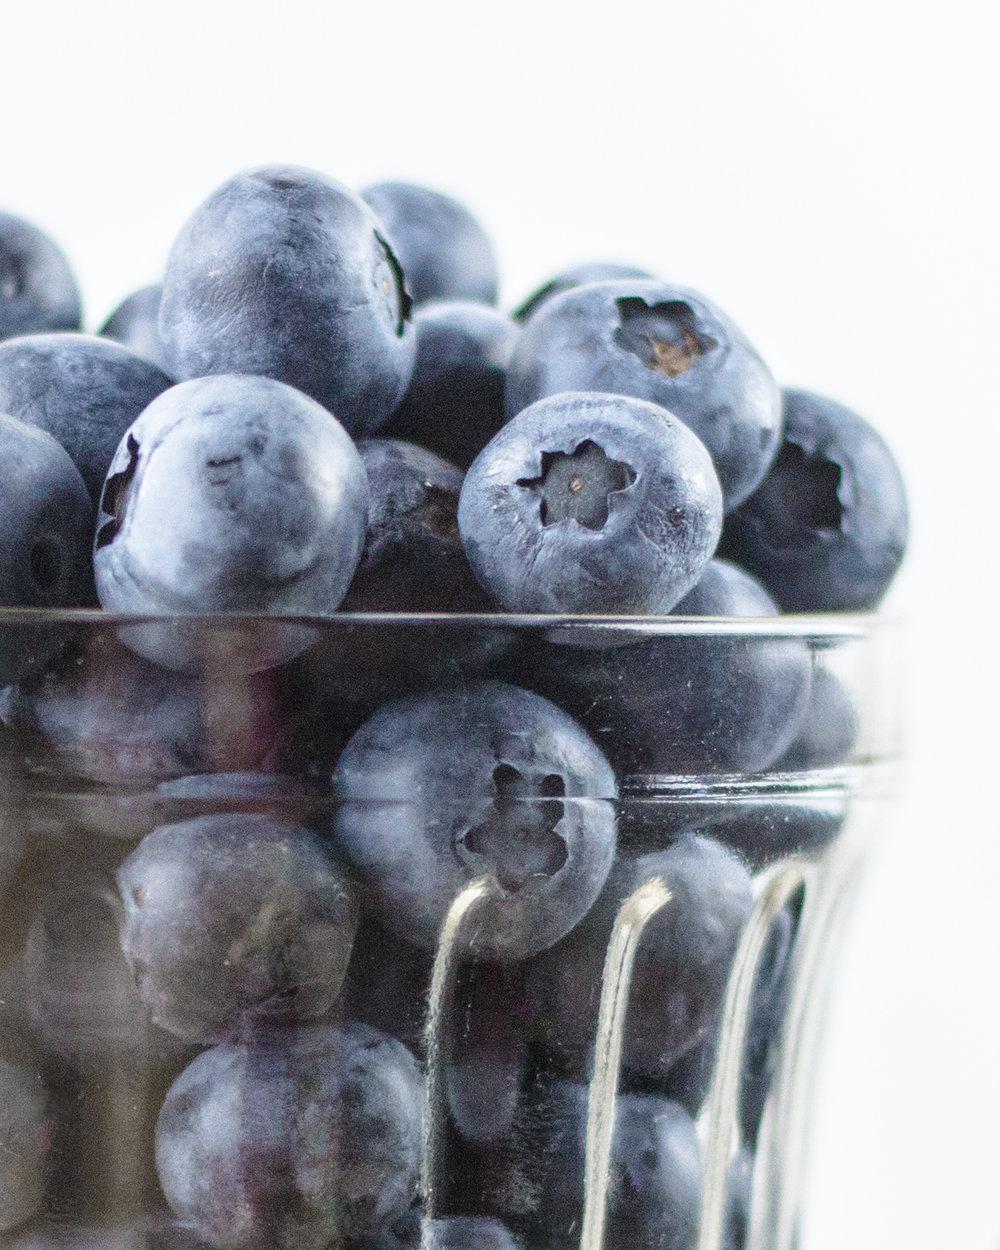 Blueberries Up Close  8x10.JPG